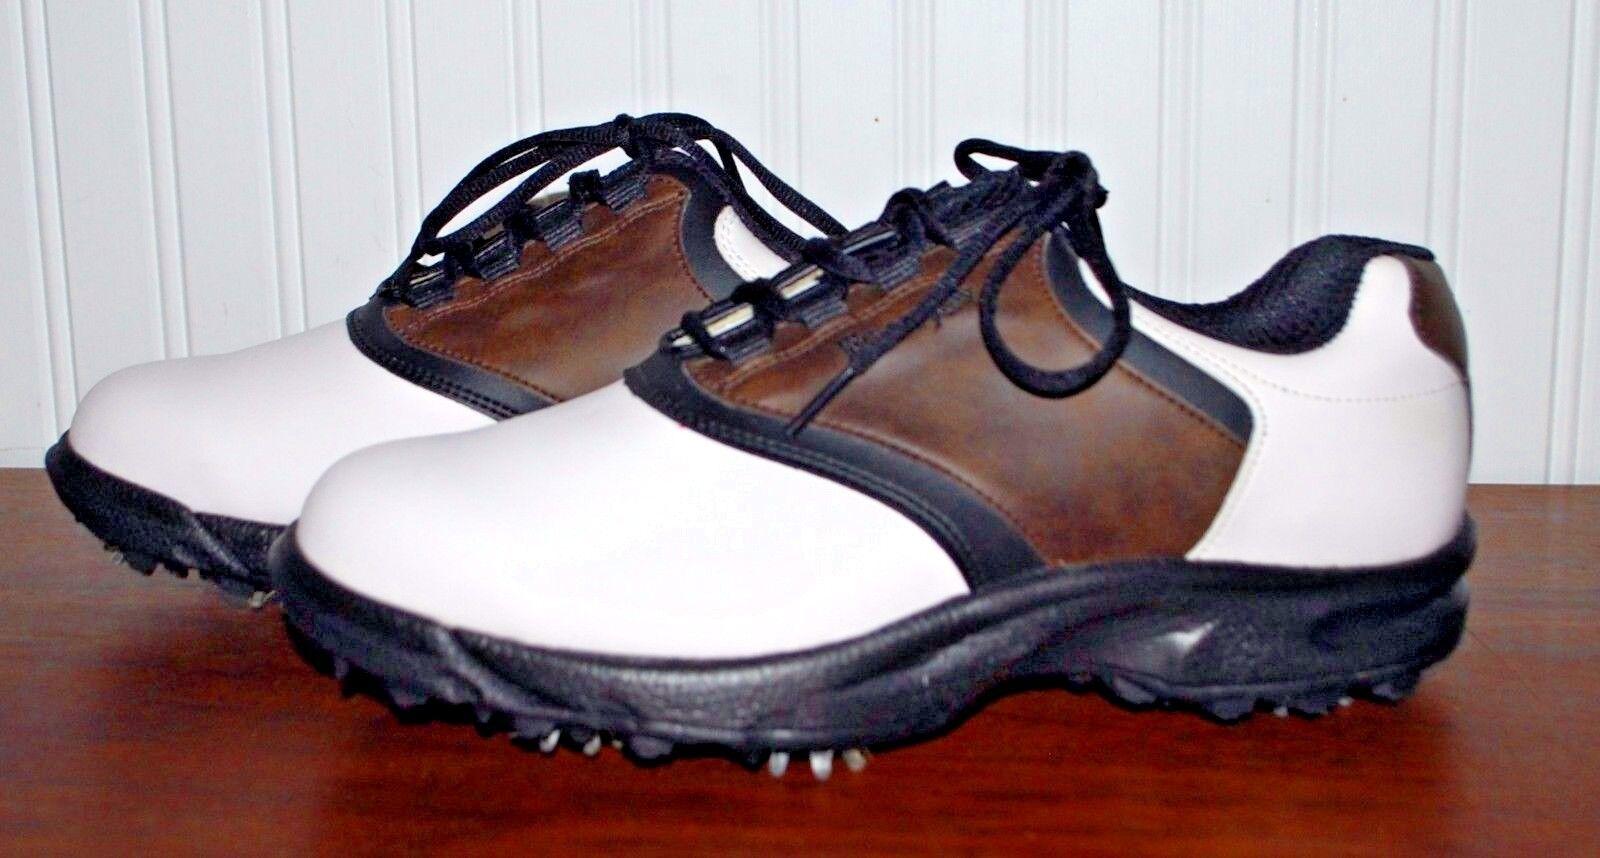 piede joy scarpa scarpa da golf mans scarpa joy verde joy taglia 9 ampia nero marrone bicolore bianco 6676c3